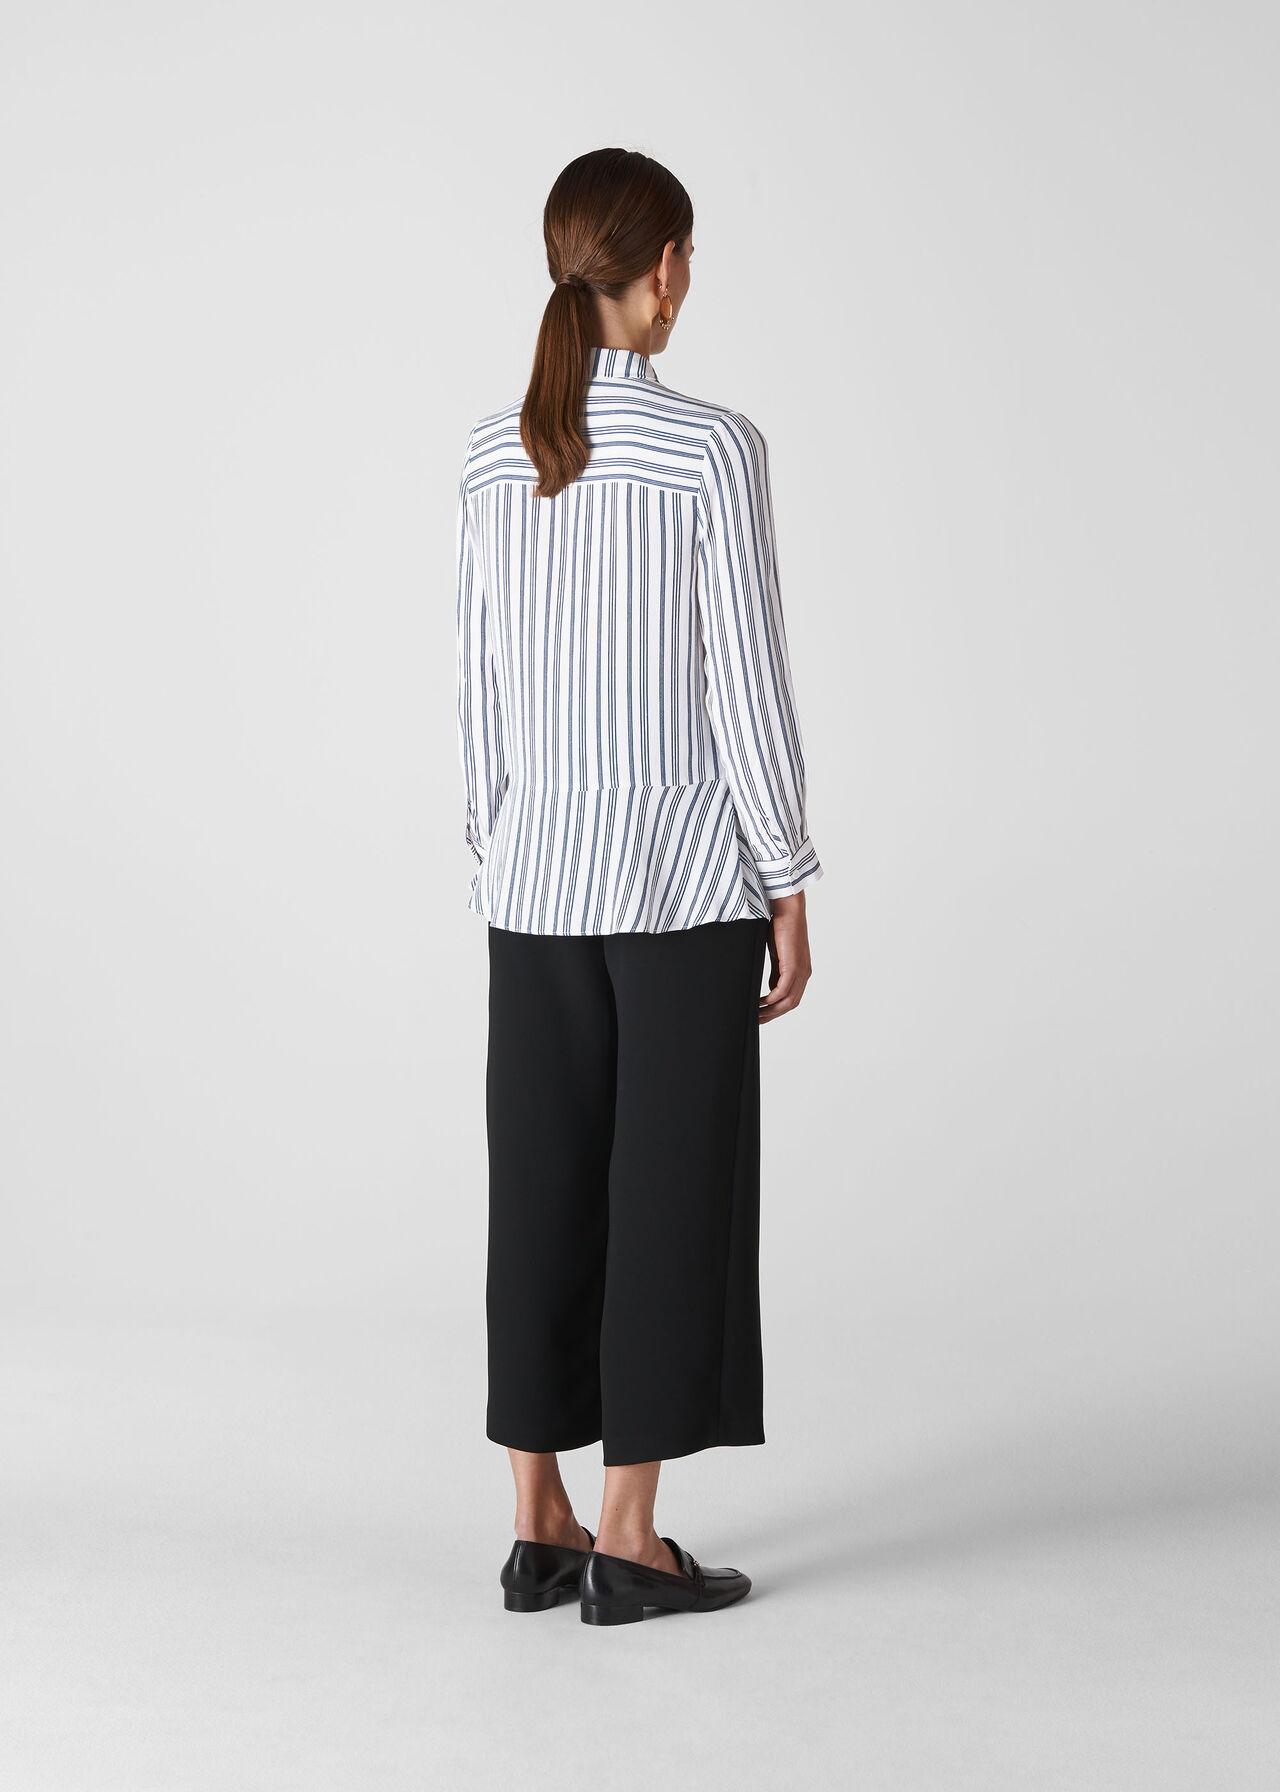 Stripe Frill Front Shirt White/Multi